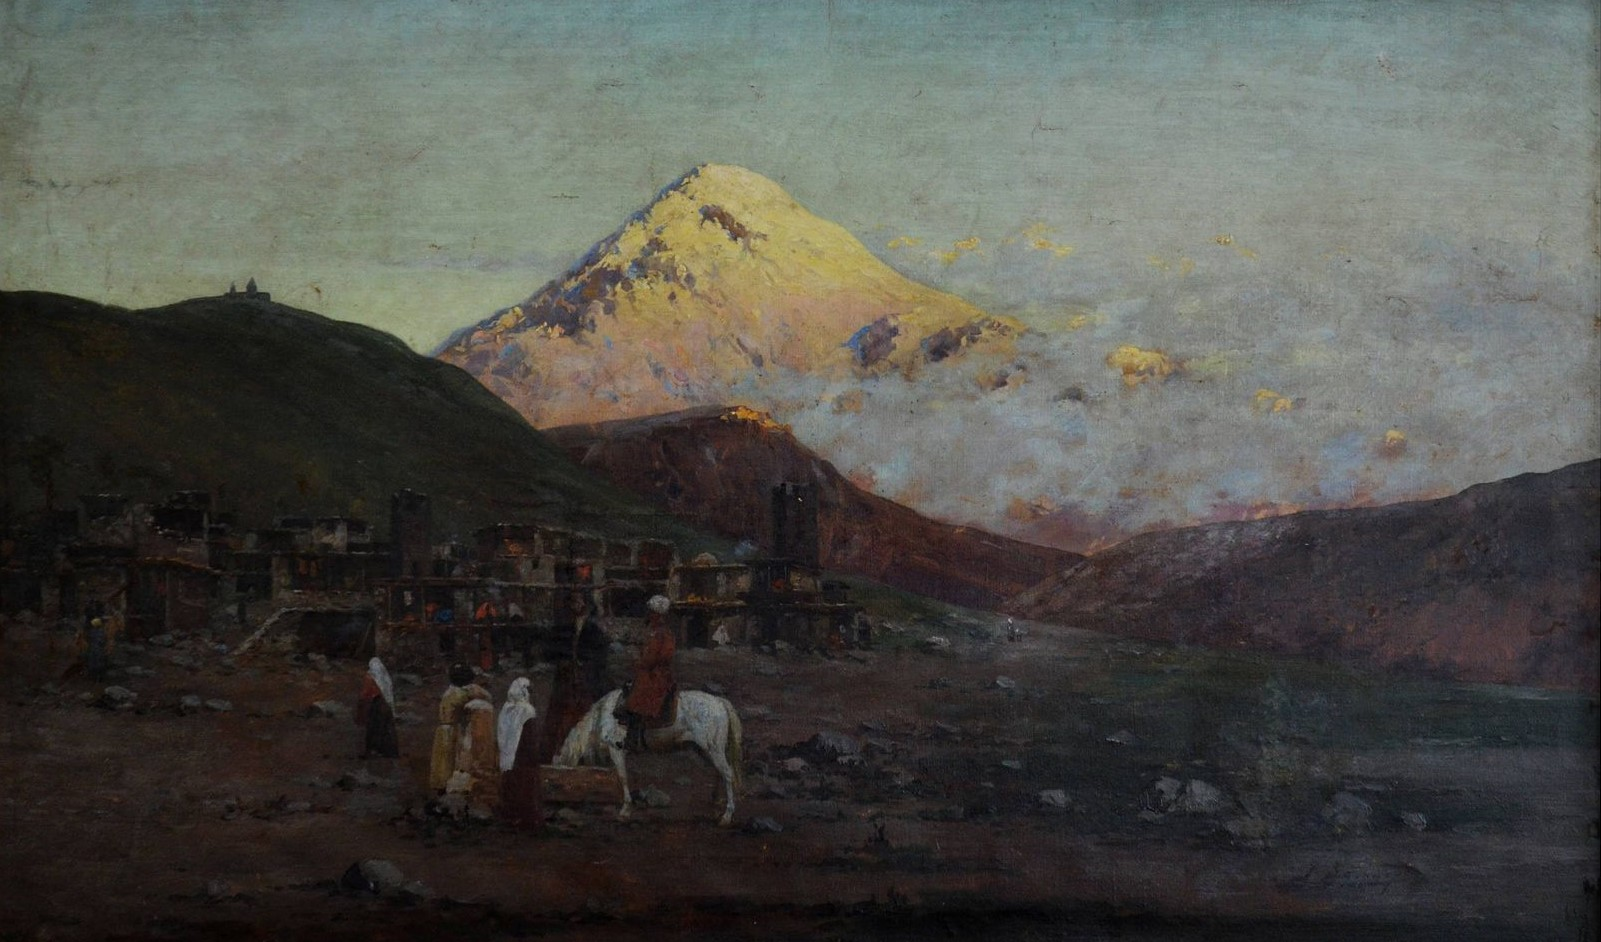 Отреставрирована картина Ричарда Зоммера «Деревня в горах - Казбеги».